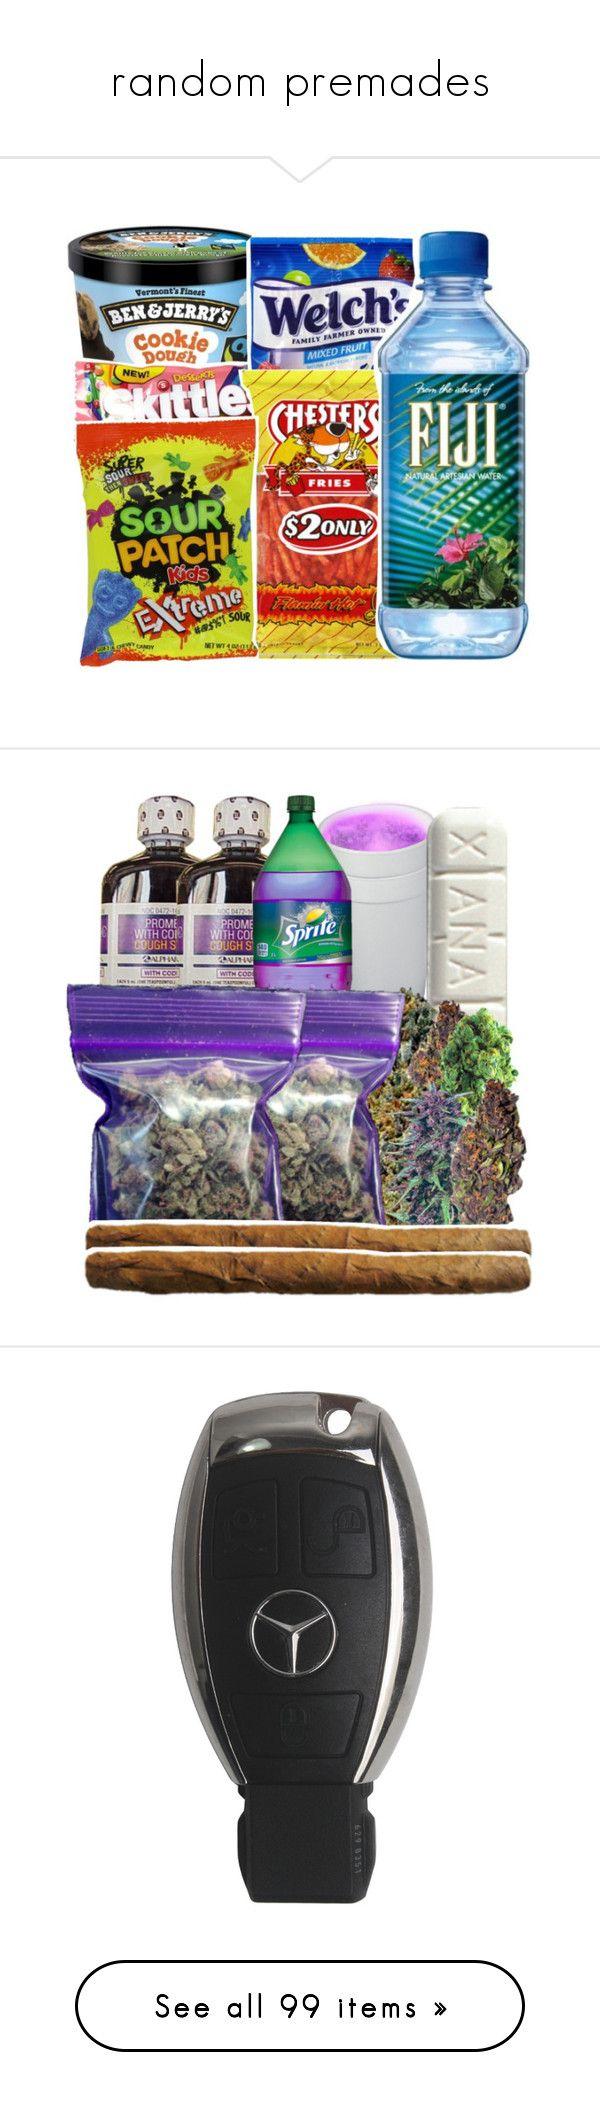 """random premades"" by purple-unicorn013 ❤ liked on Polyvore featuring Jack Spade, SunaharA, Michael Kors, Victoria's Secret, Topshop, Anita Ko, Lancôme, food, premade and food and drink"